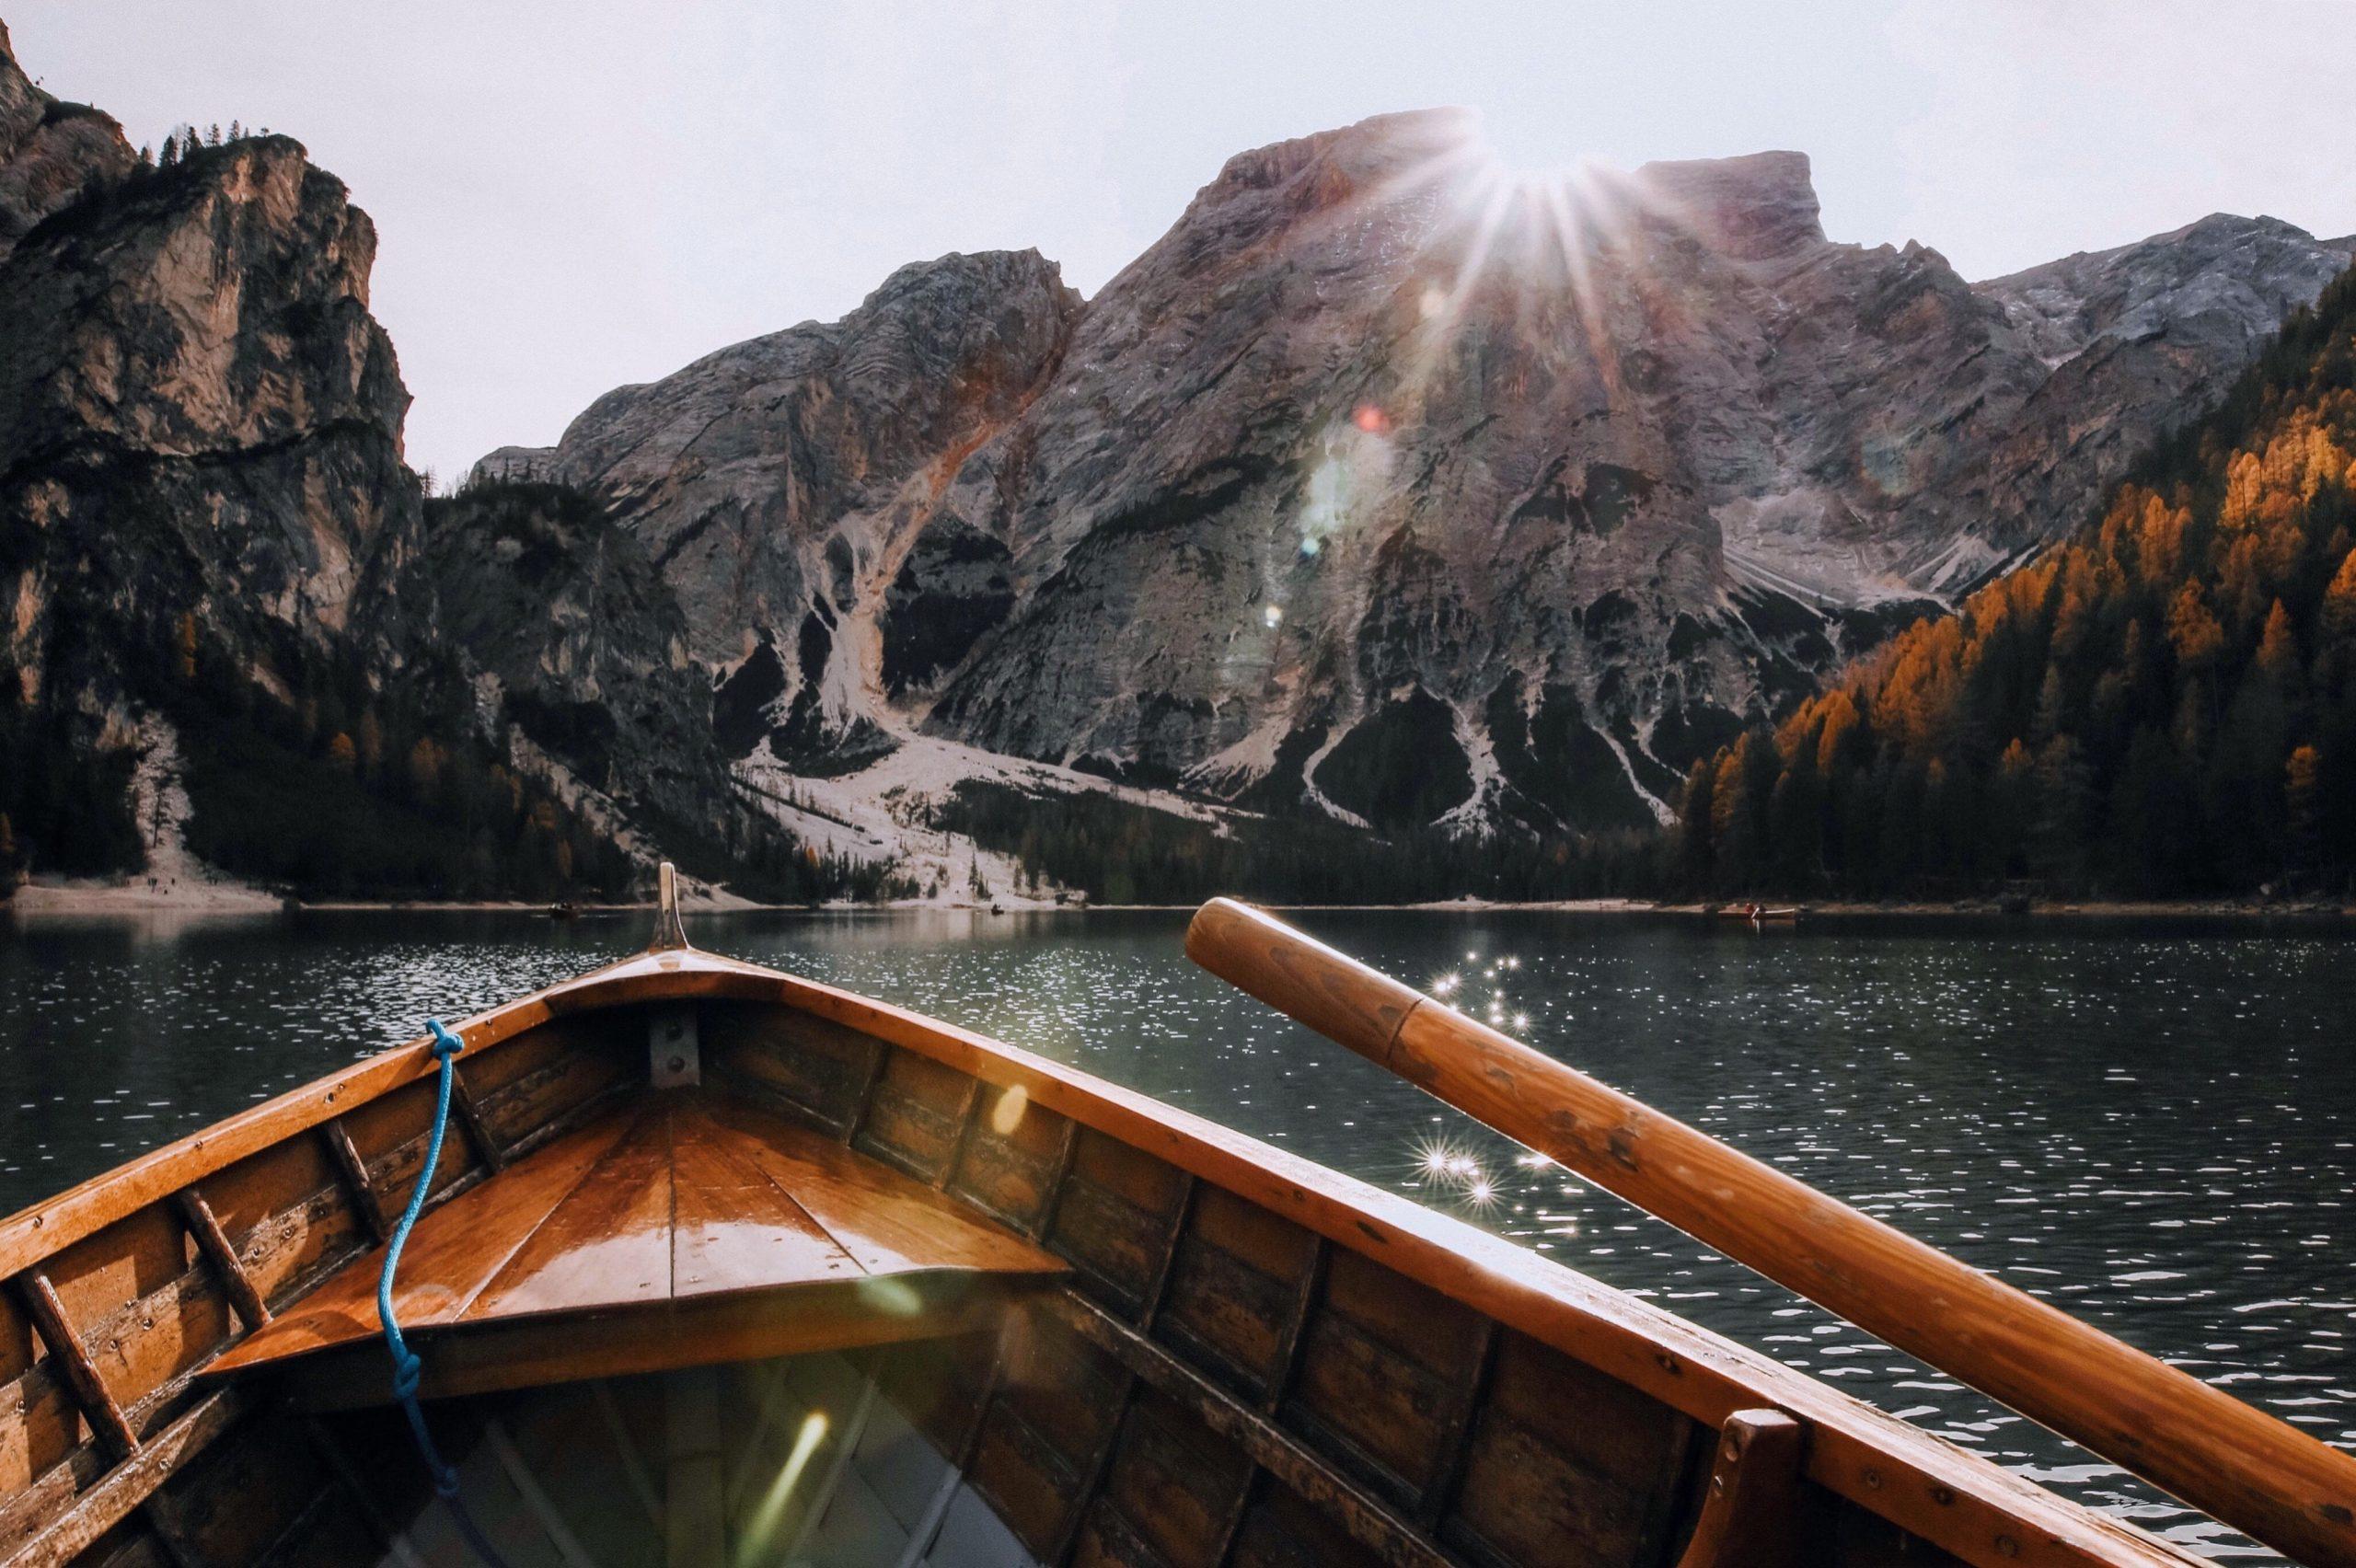 Gründungswerft Bild, Boot im See